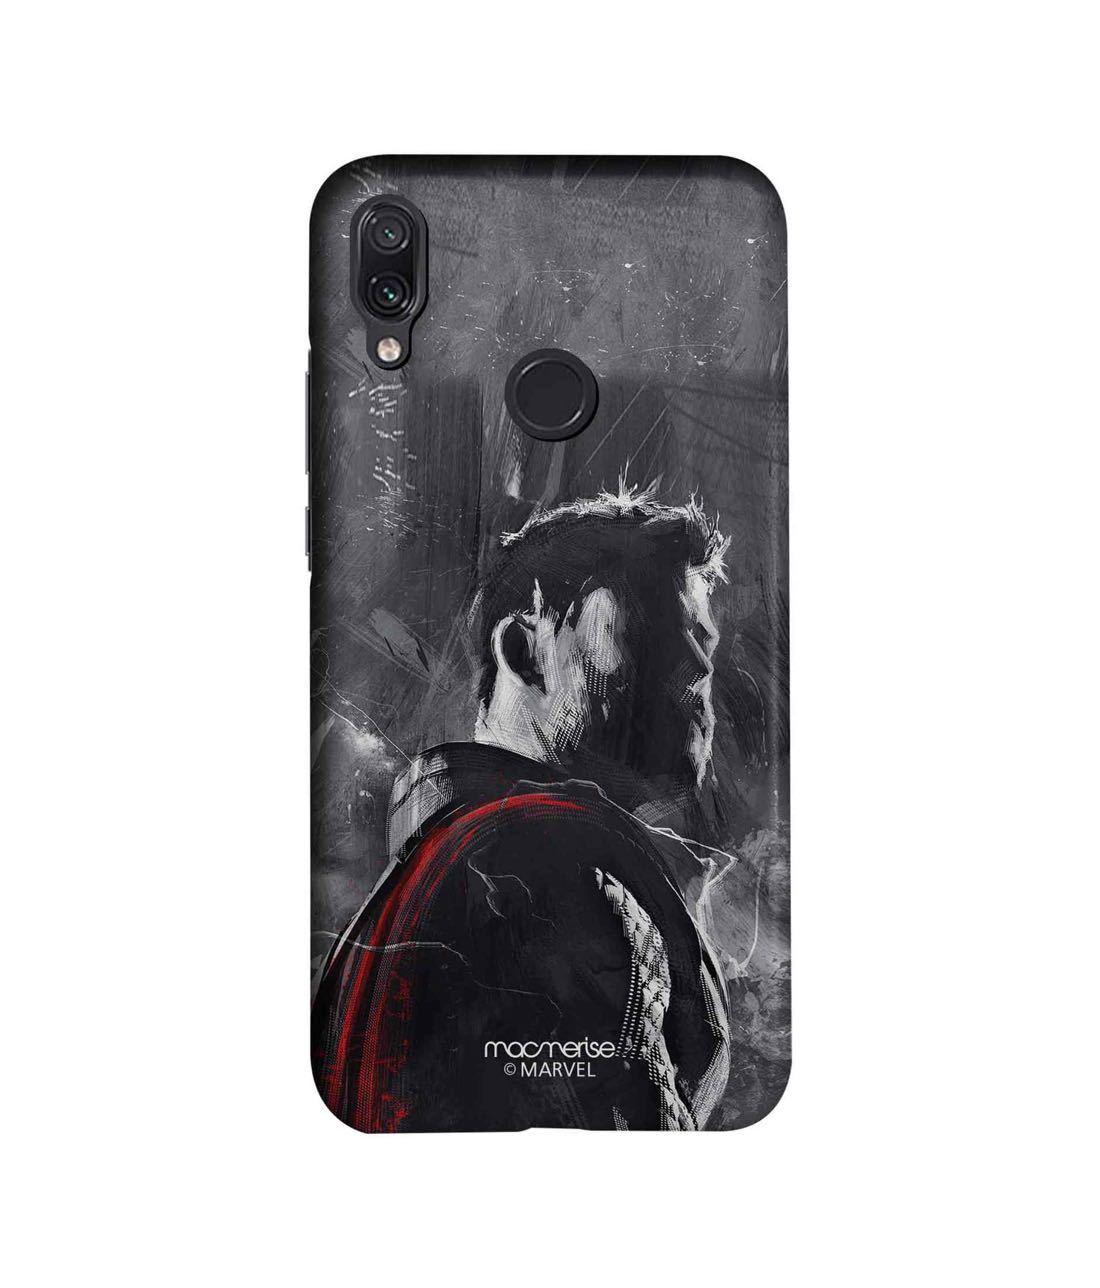 Charcoal Art Thor - Sleek Phone Case for Xiaomi Redmi Note 7 Pro